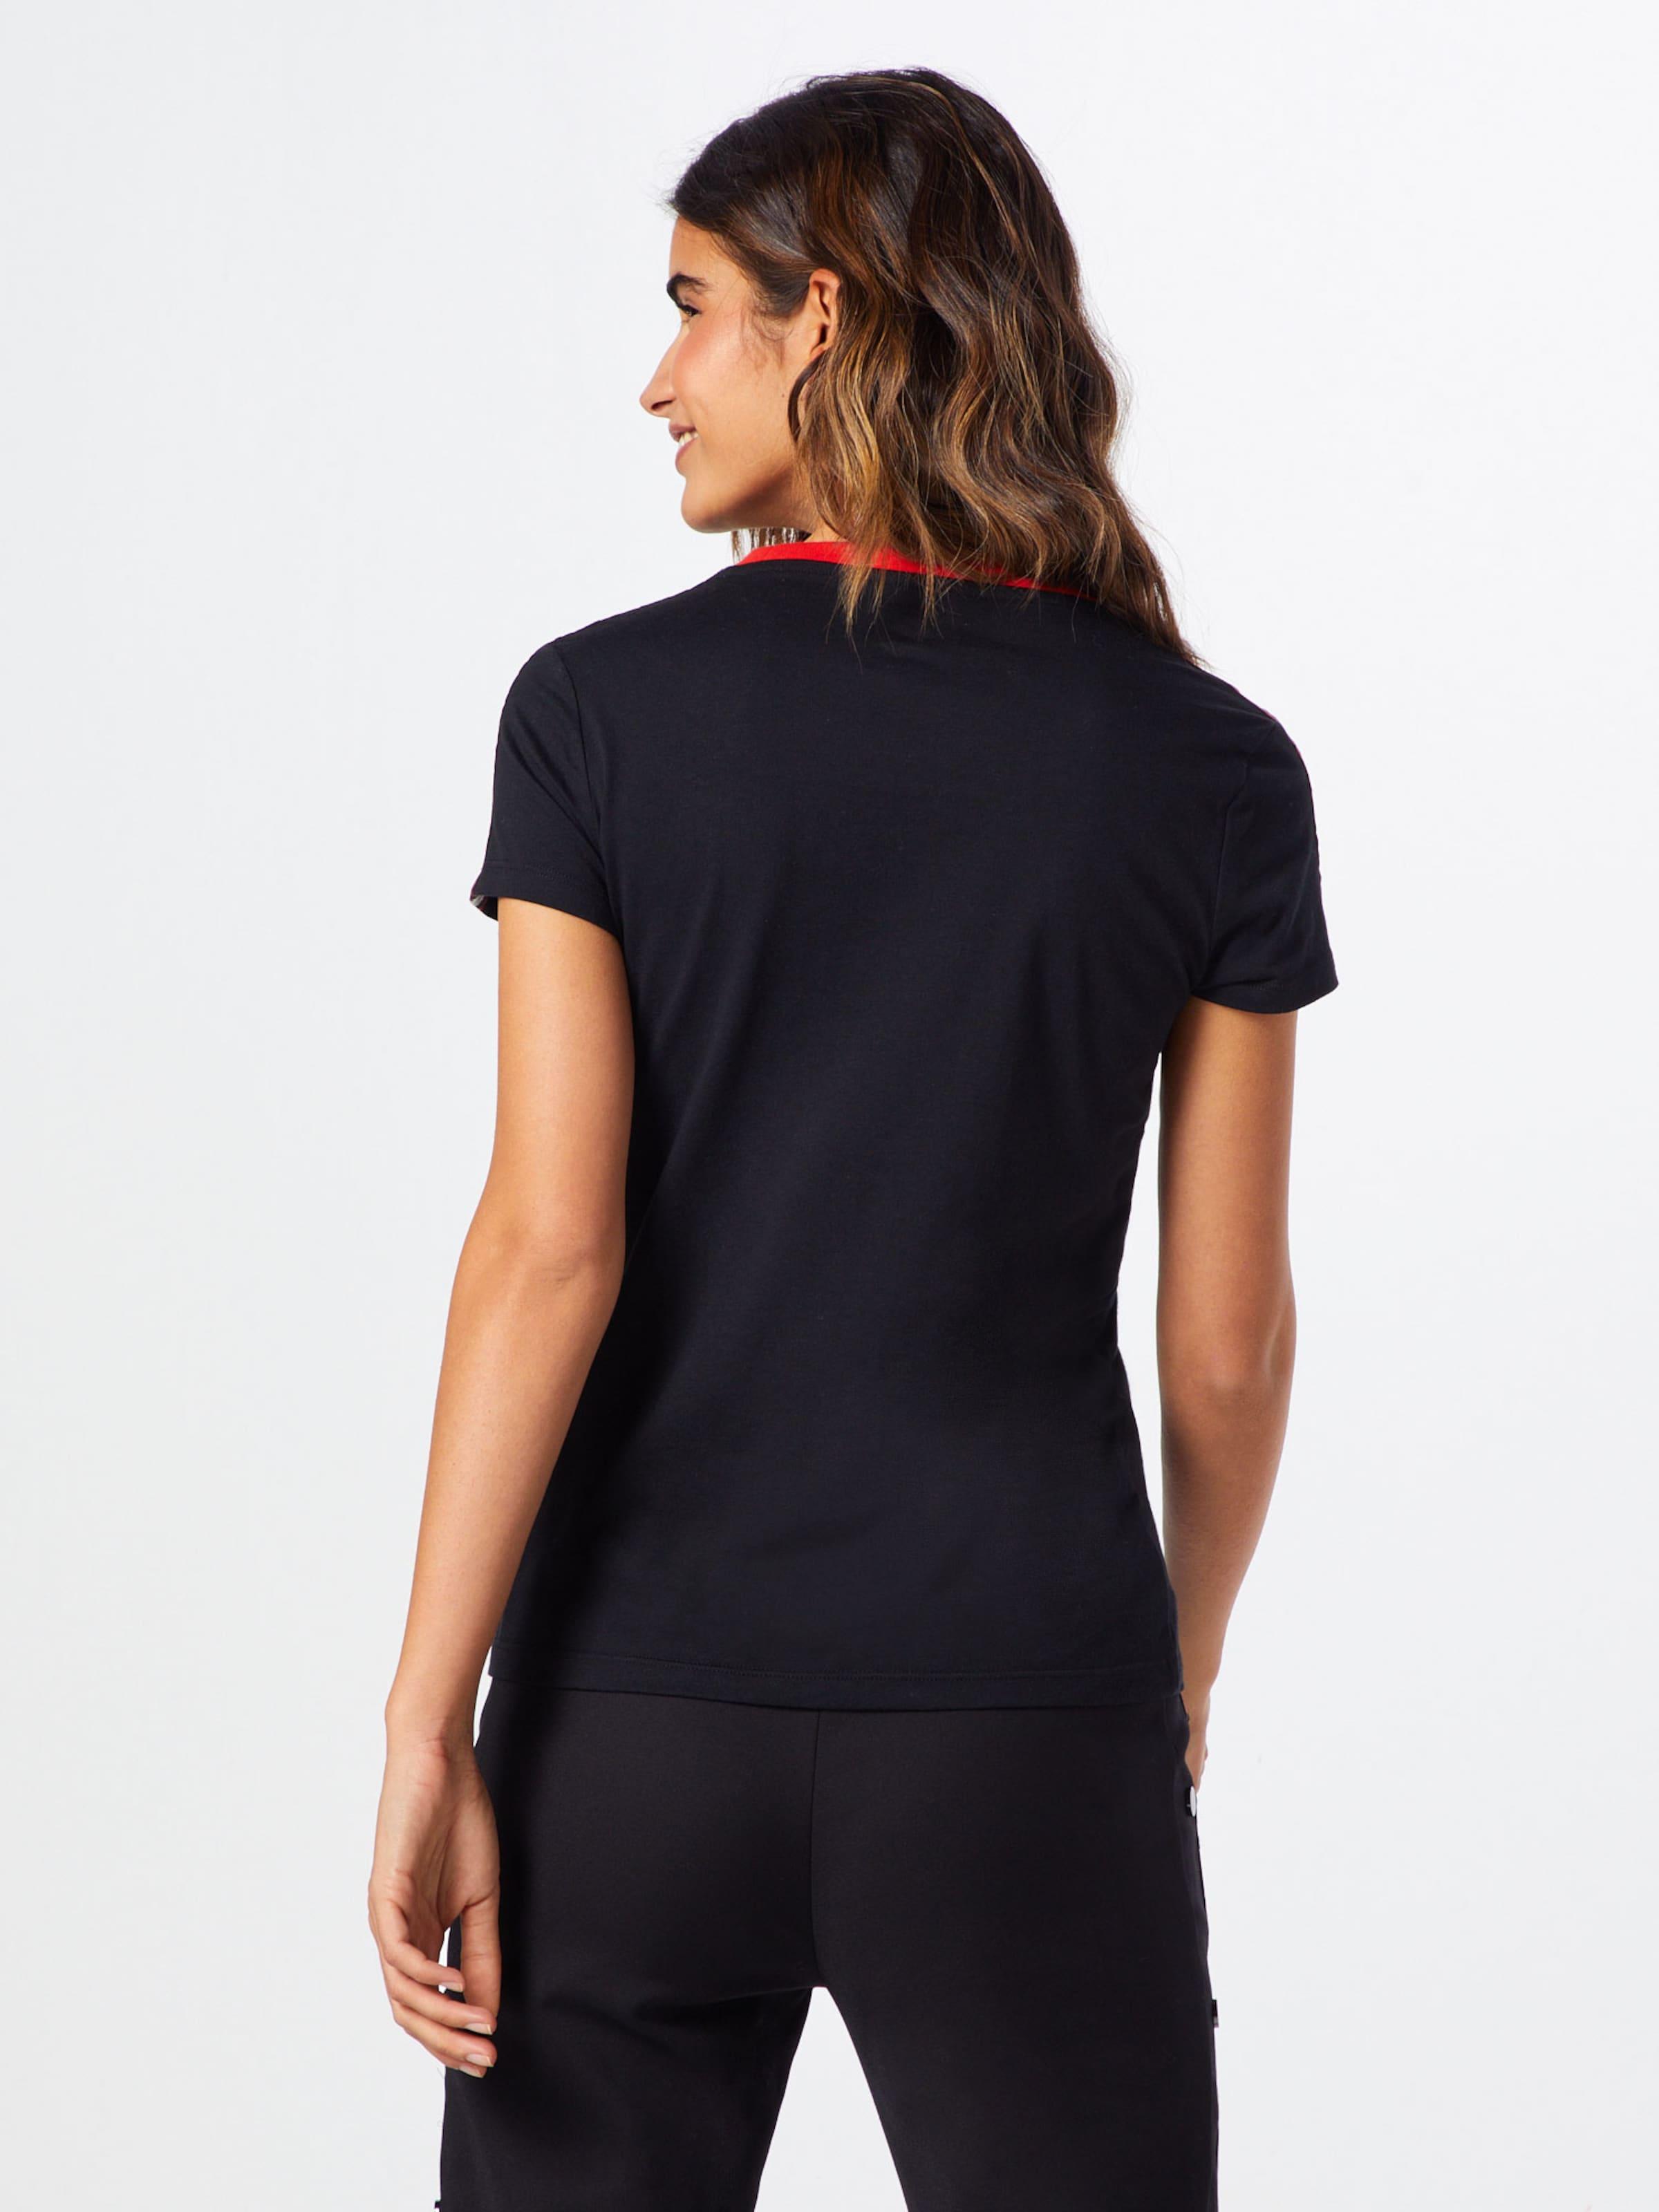 shirt X En Black' Hello Tee Ringer Converse s S T 'converse Kitty RougeNoir PikXZu